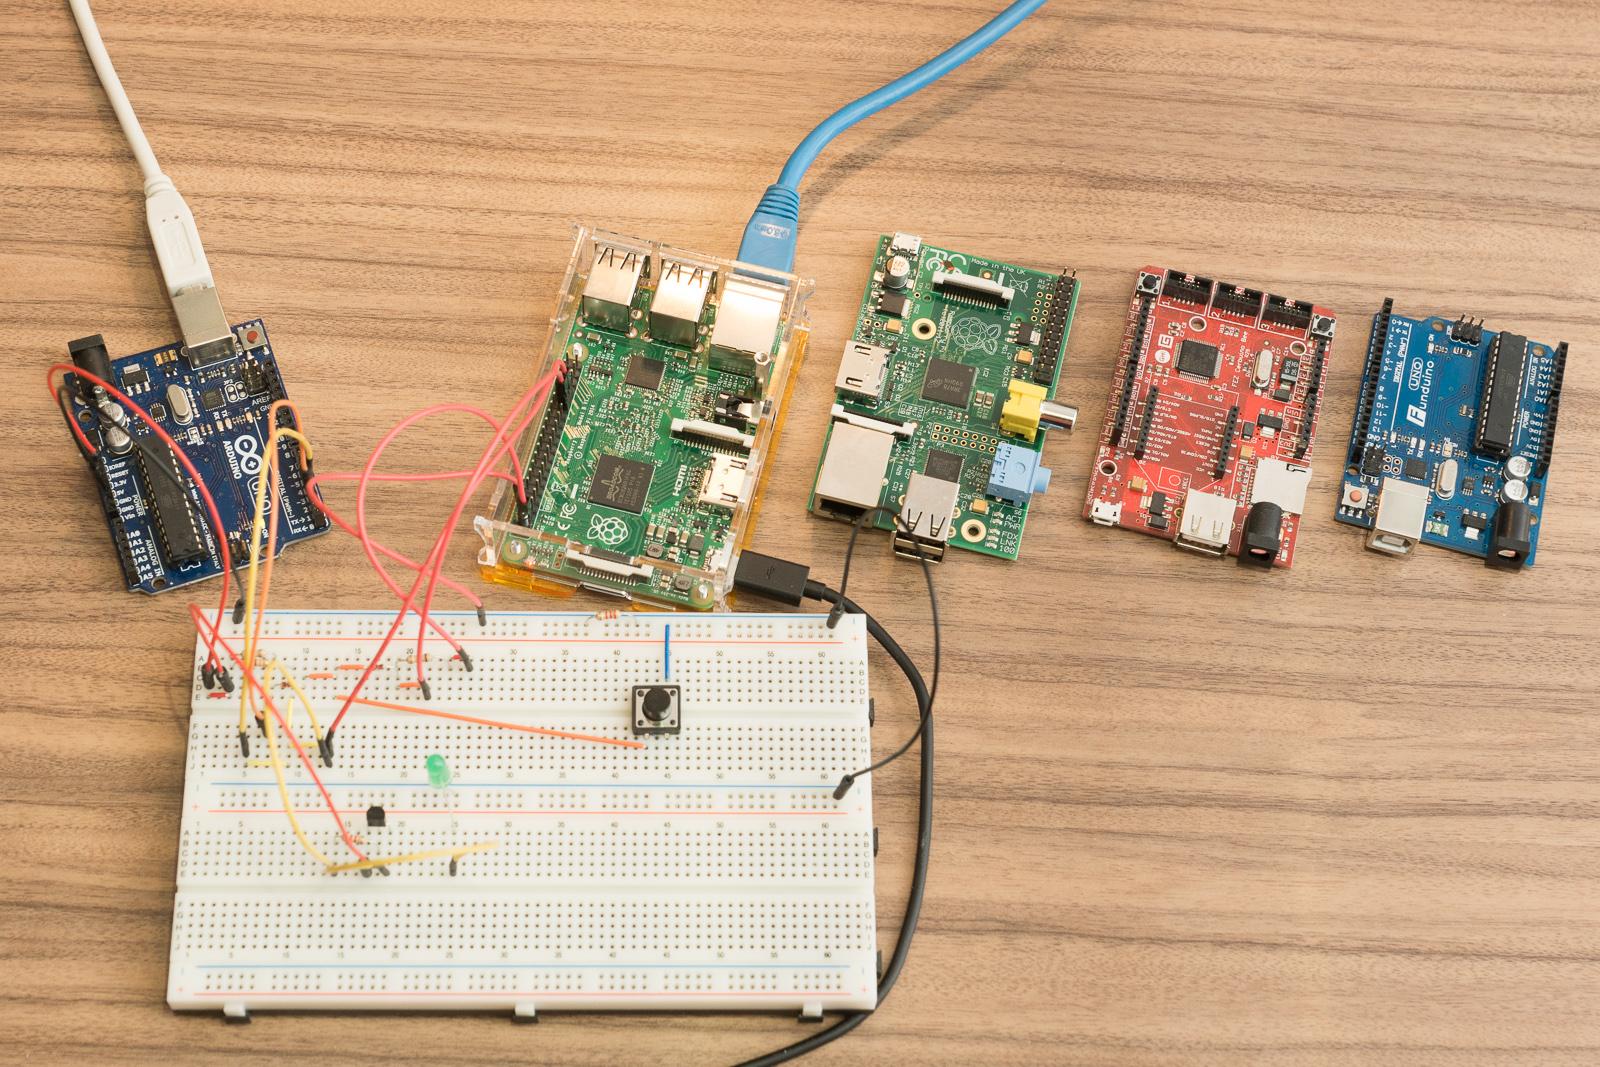 Reaktionszeit vergleich: raspberry pi 2 windows 10 vs mono vs python